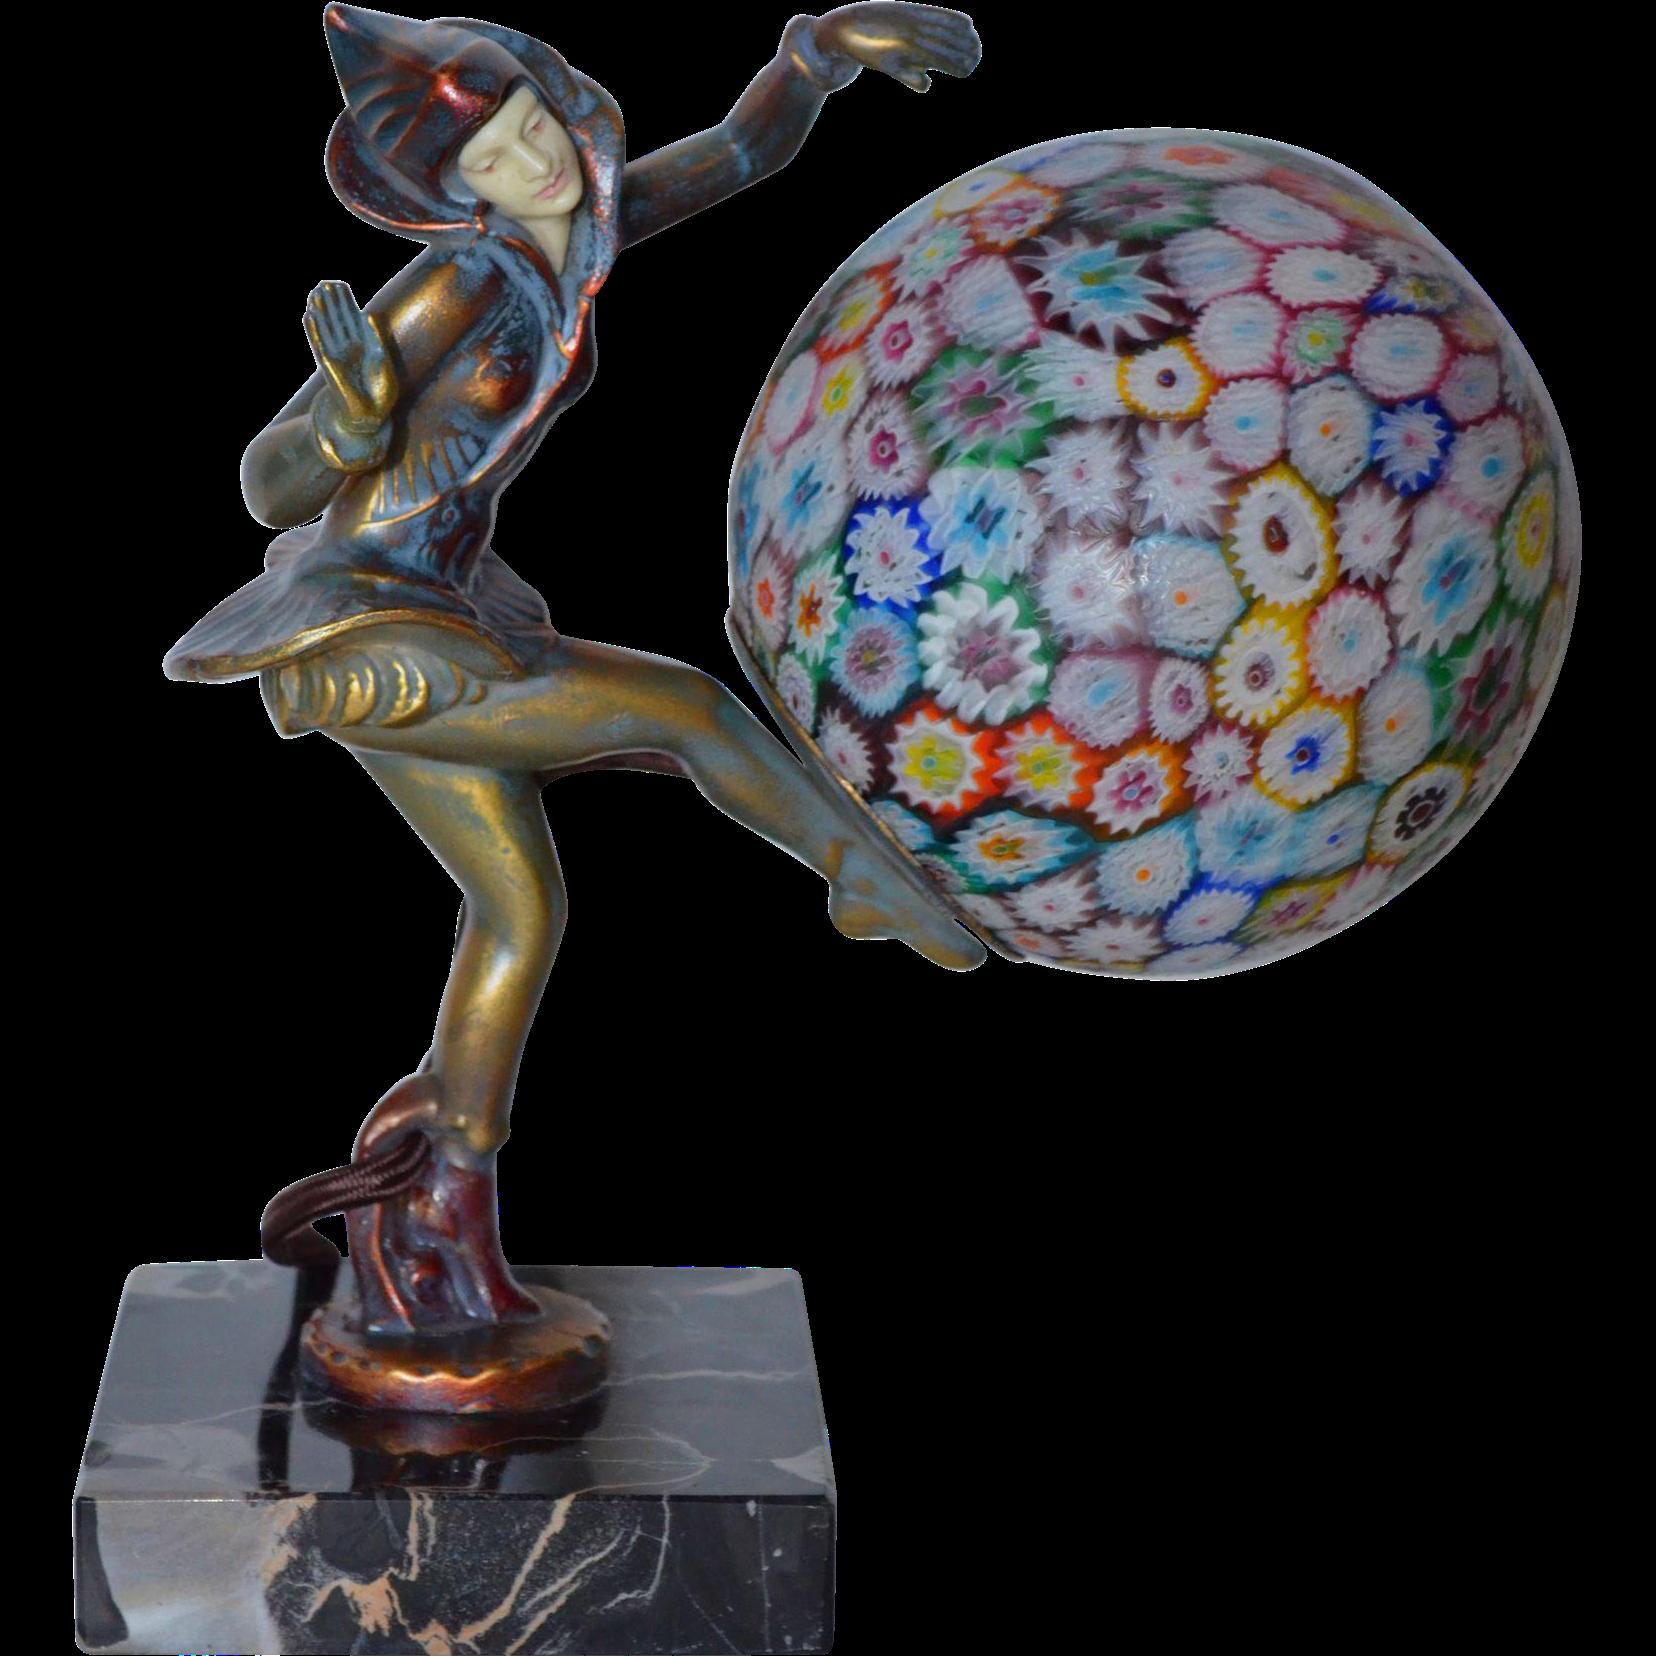 art deco pixie lamp by gerdago from